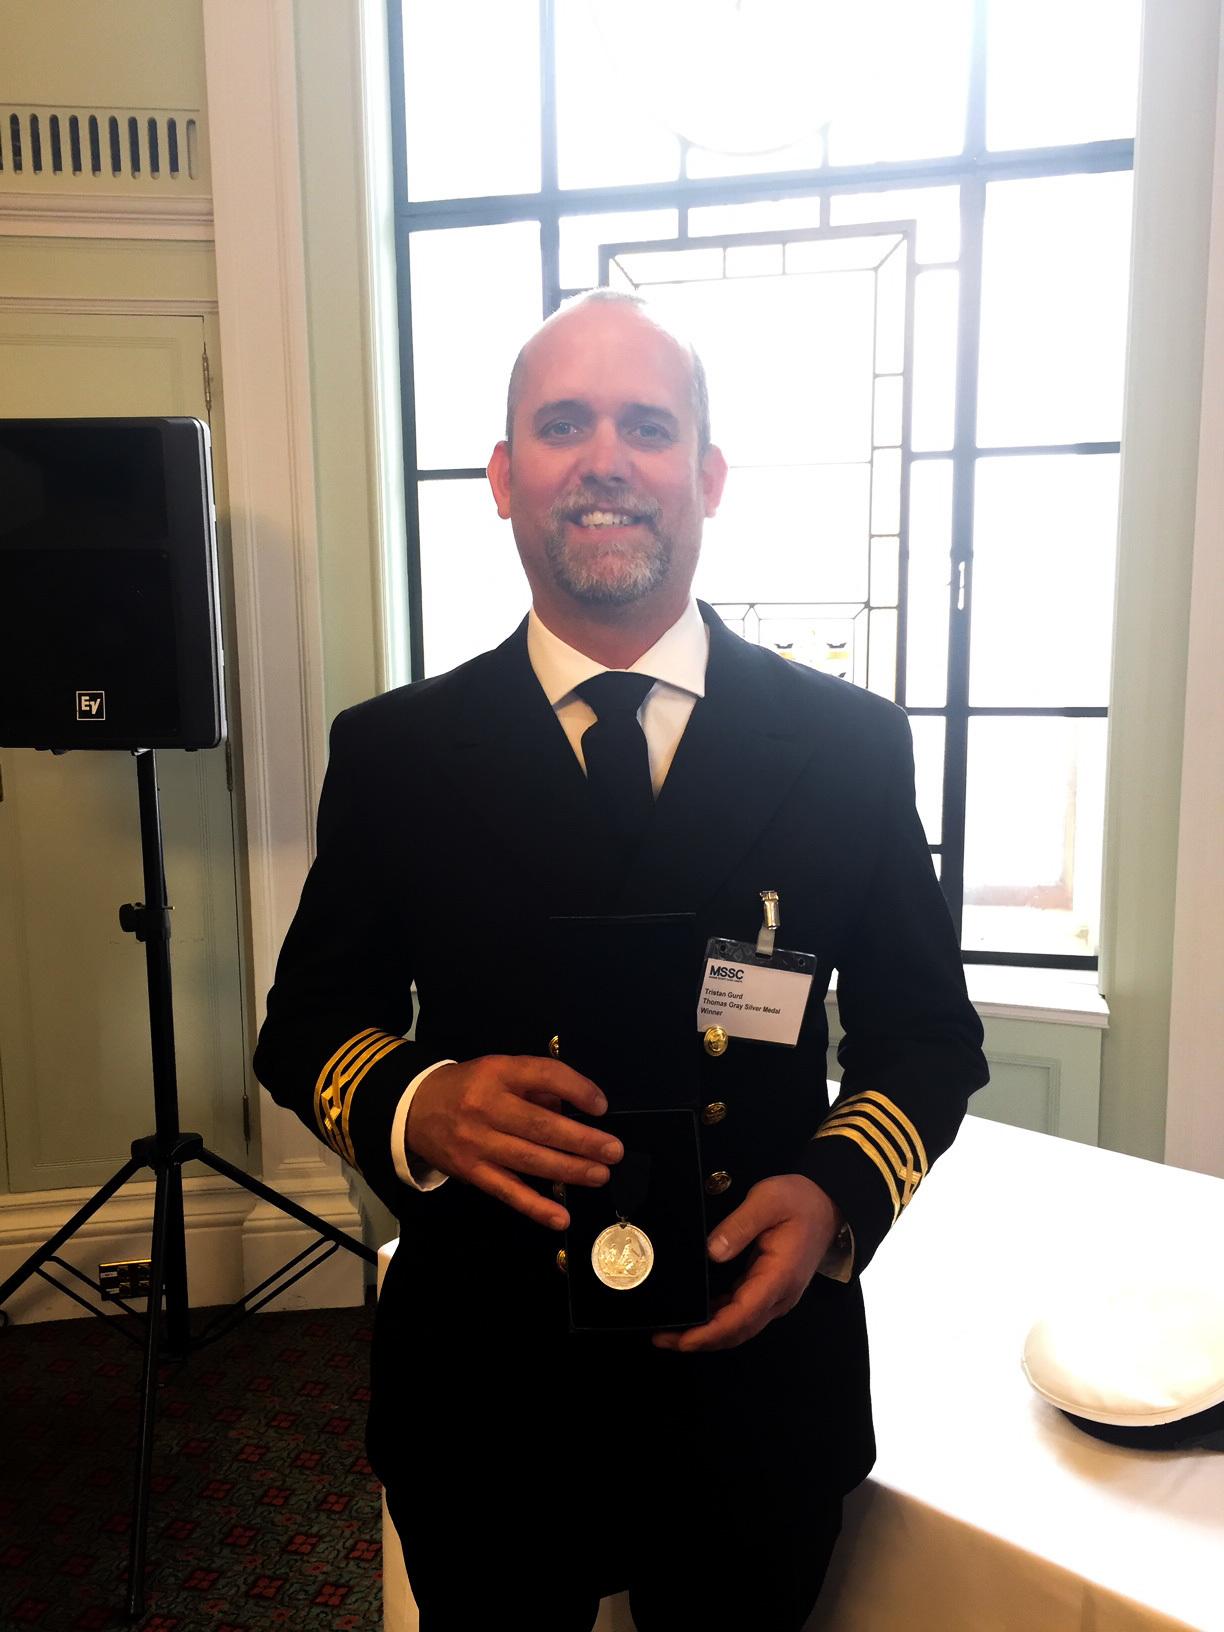 Tristan Gurd is awarded Thomas Gray Memorial Trust Silver Medal